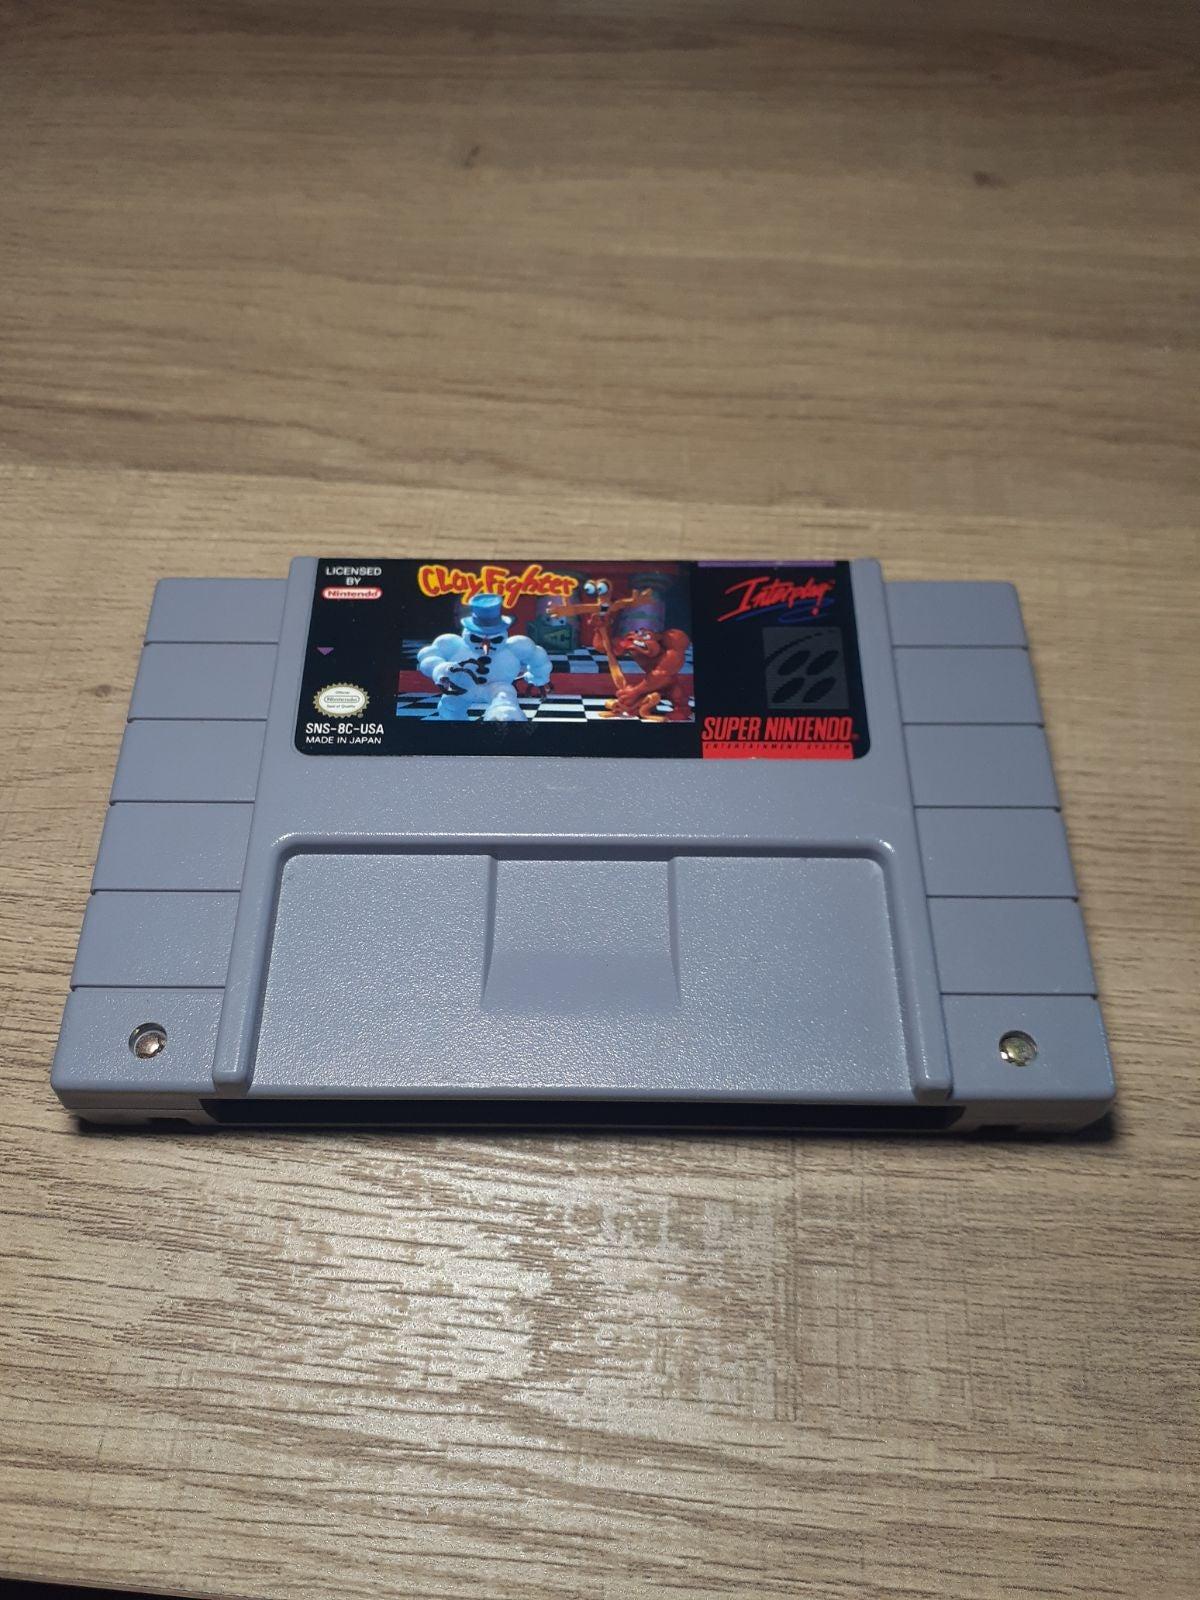 ClayFighter on Nintendo Super NES